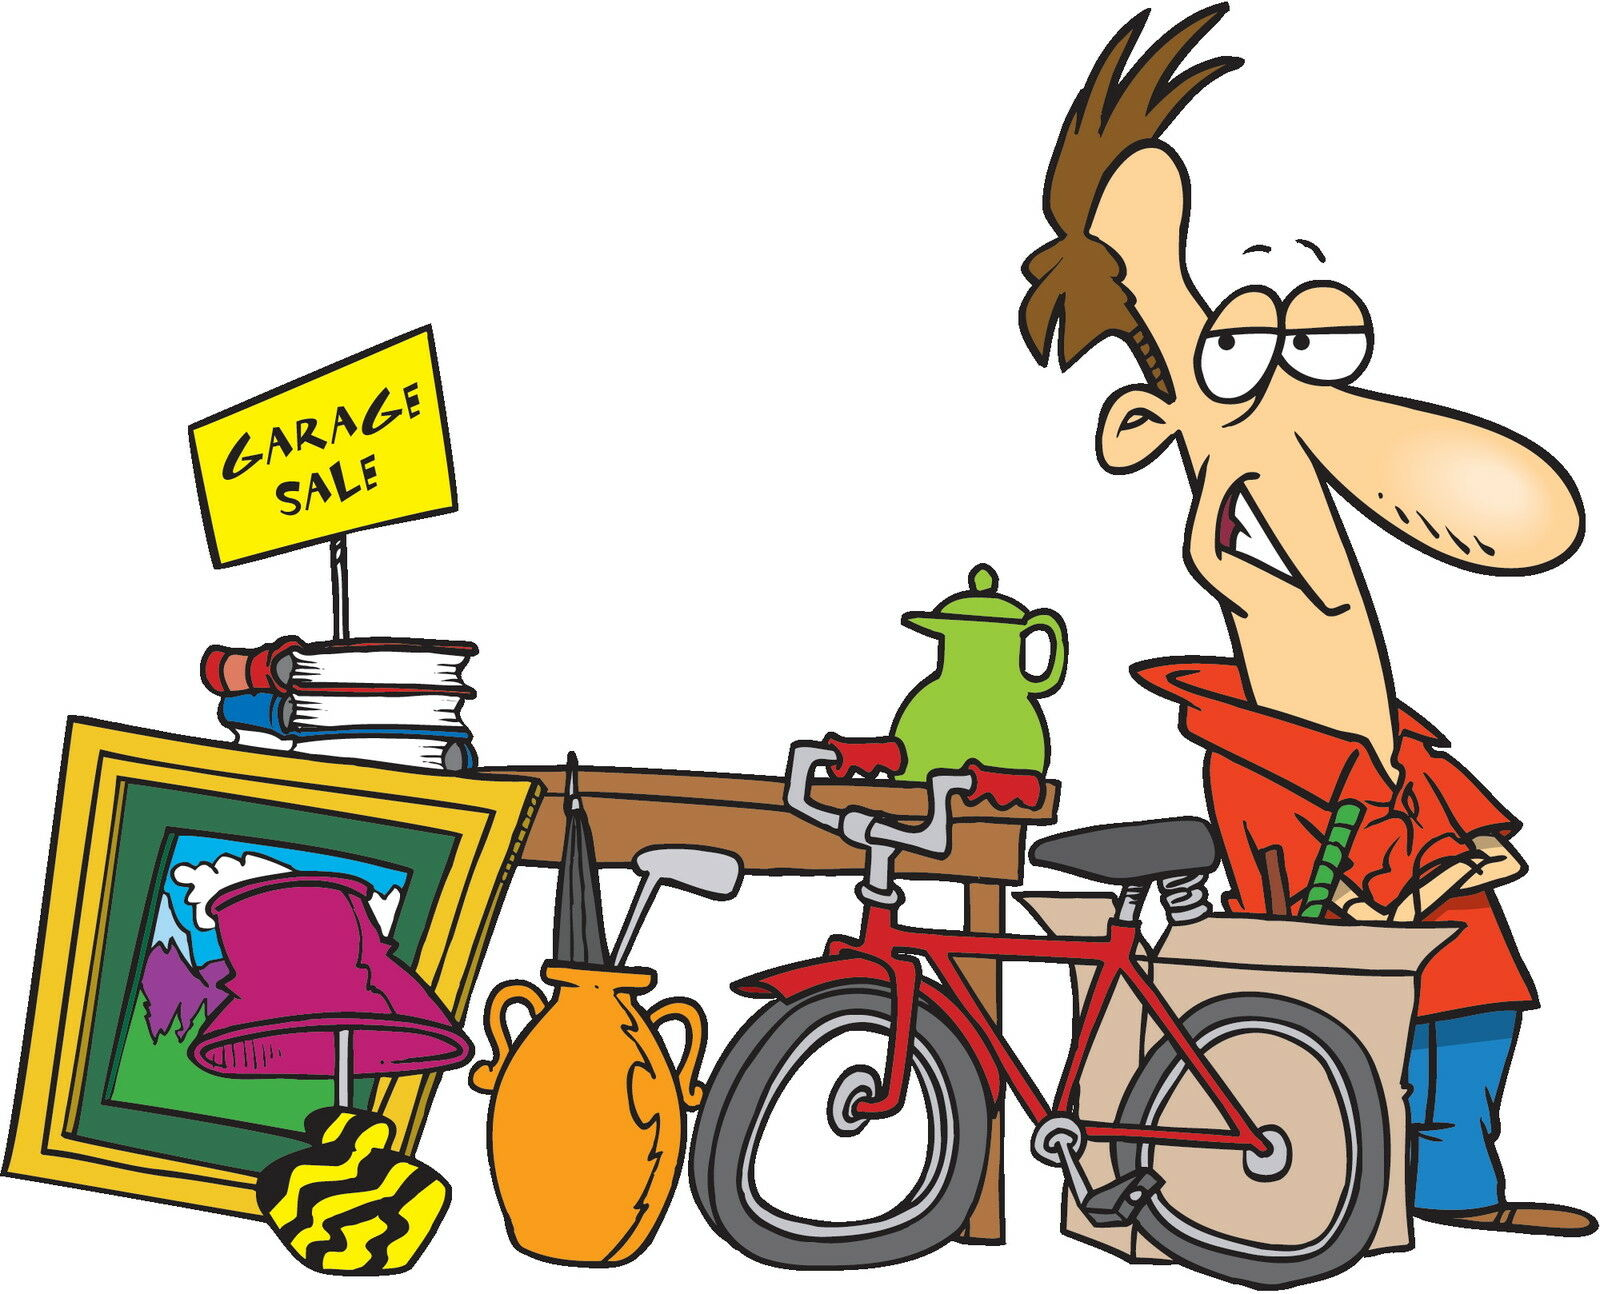 Terwilliger Garage